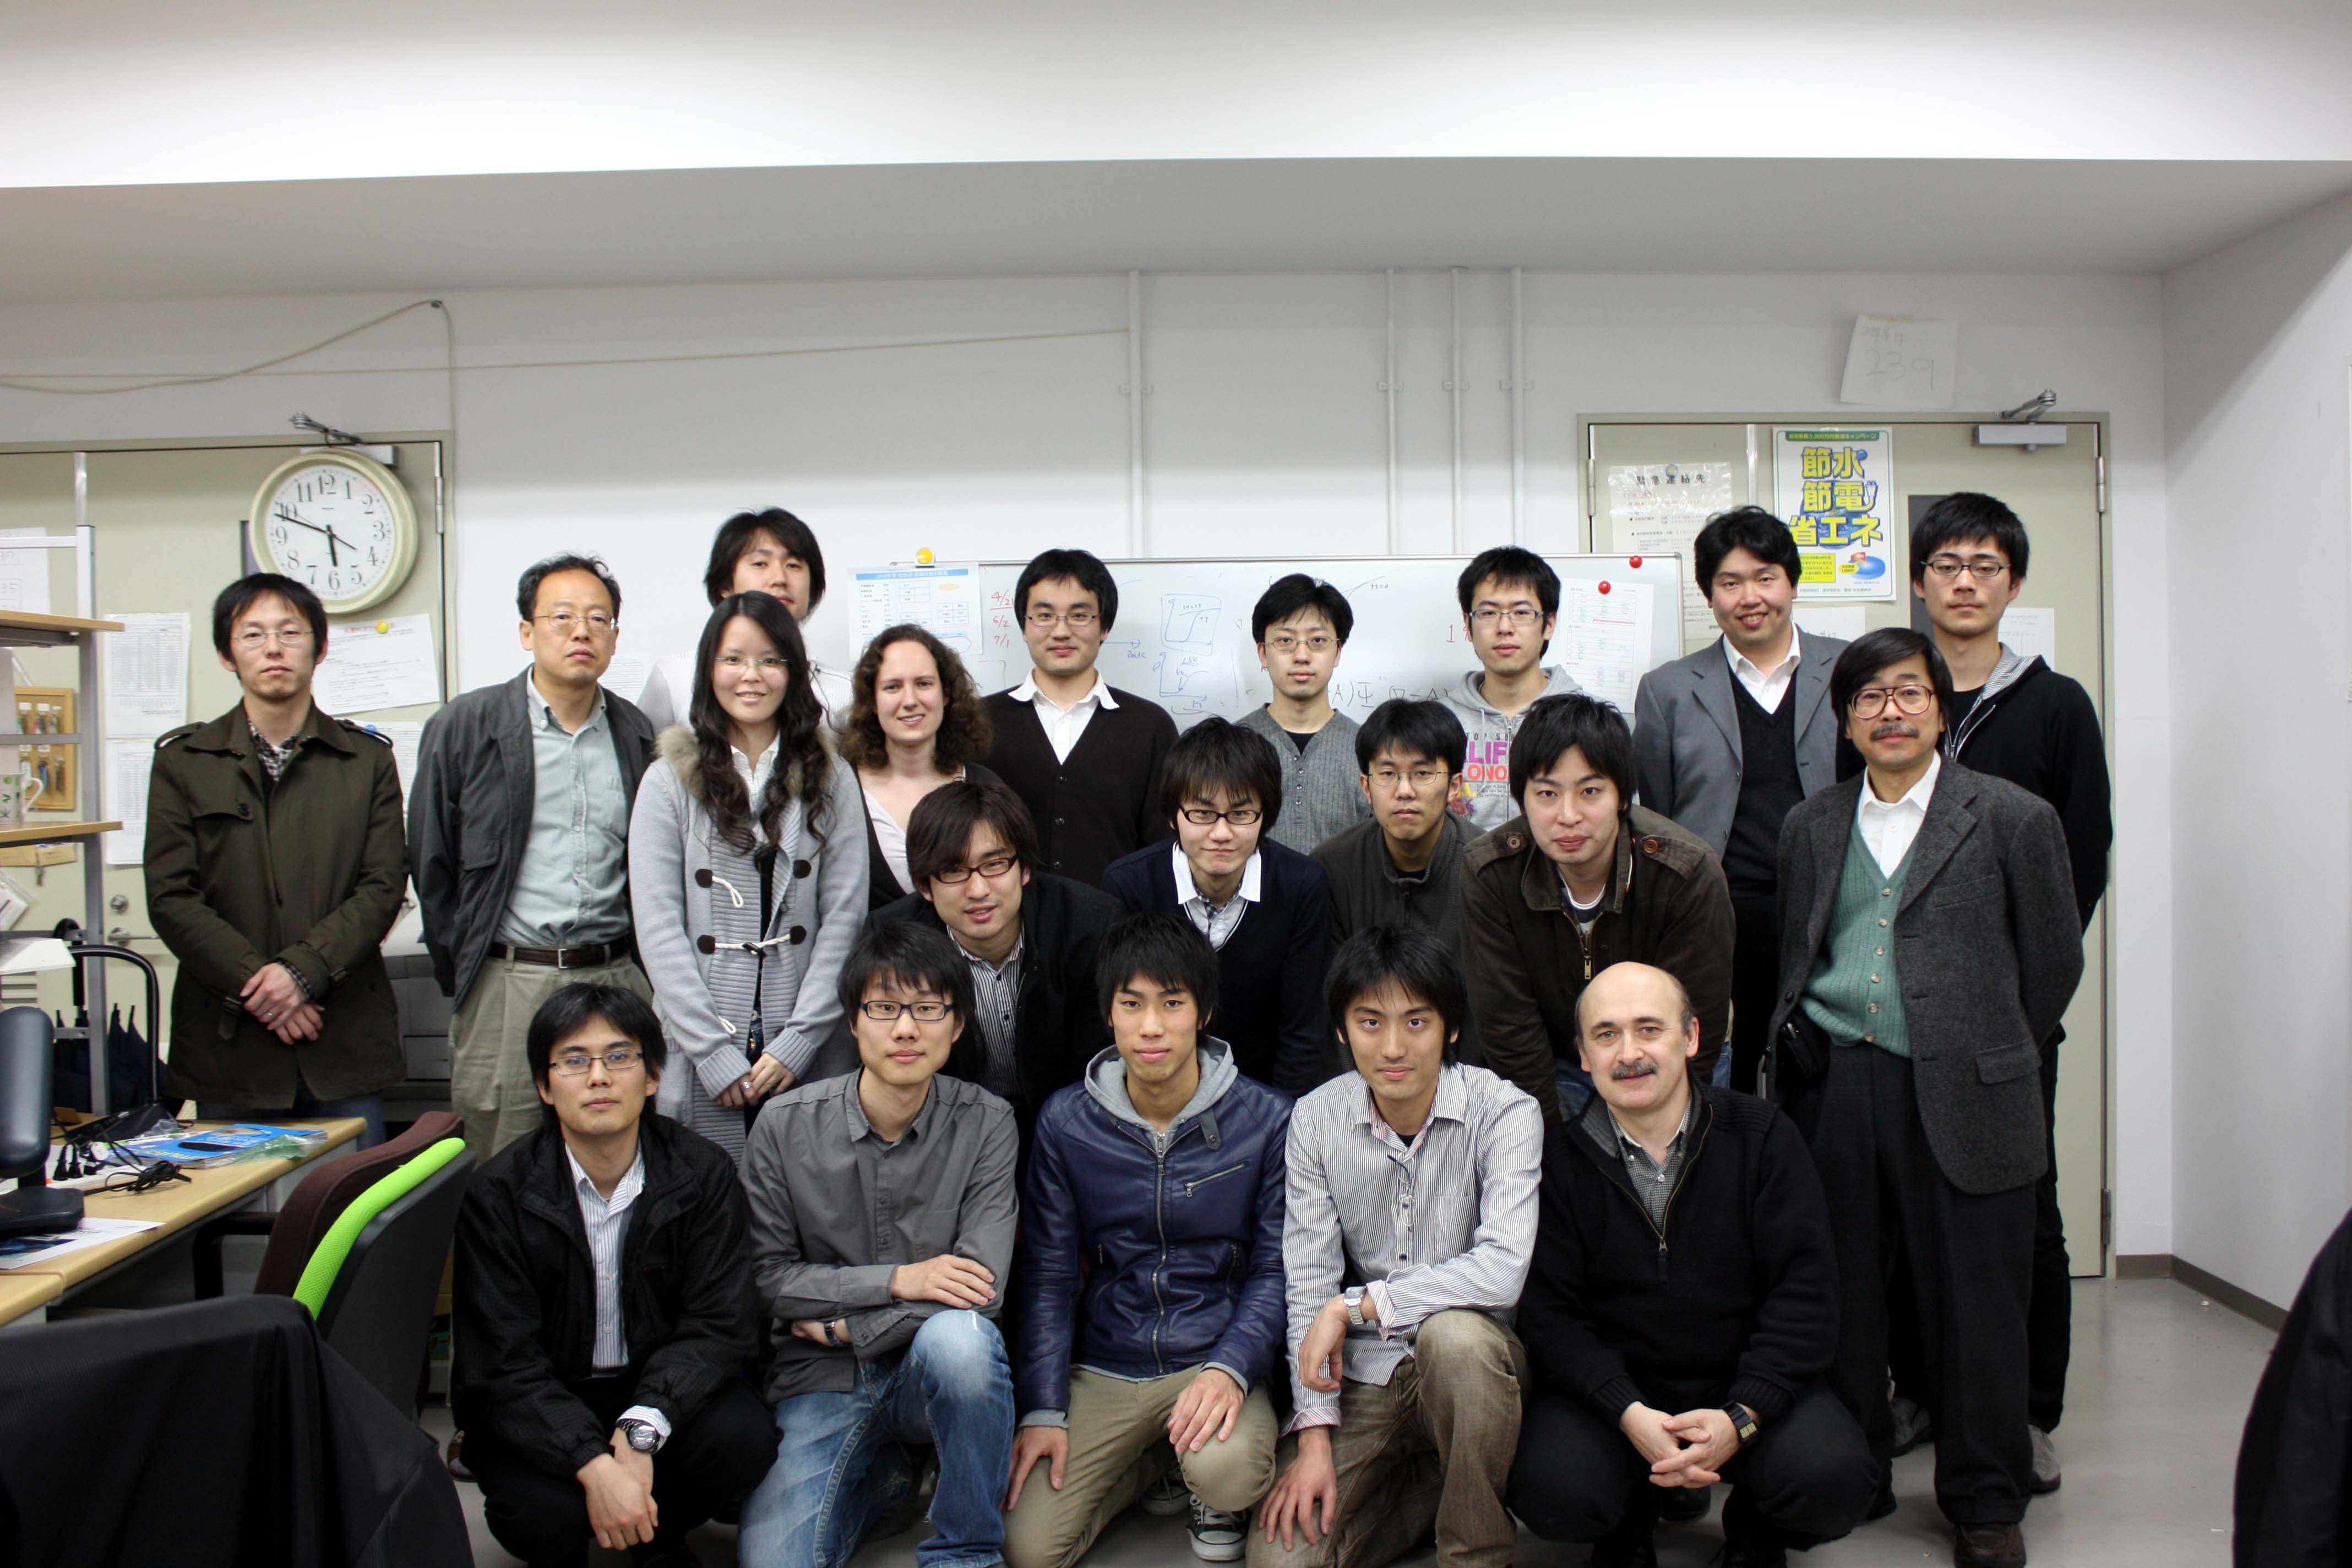 group_photo_Apr17_2010_2.jpg